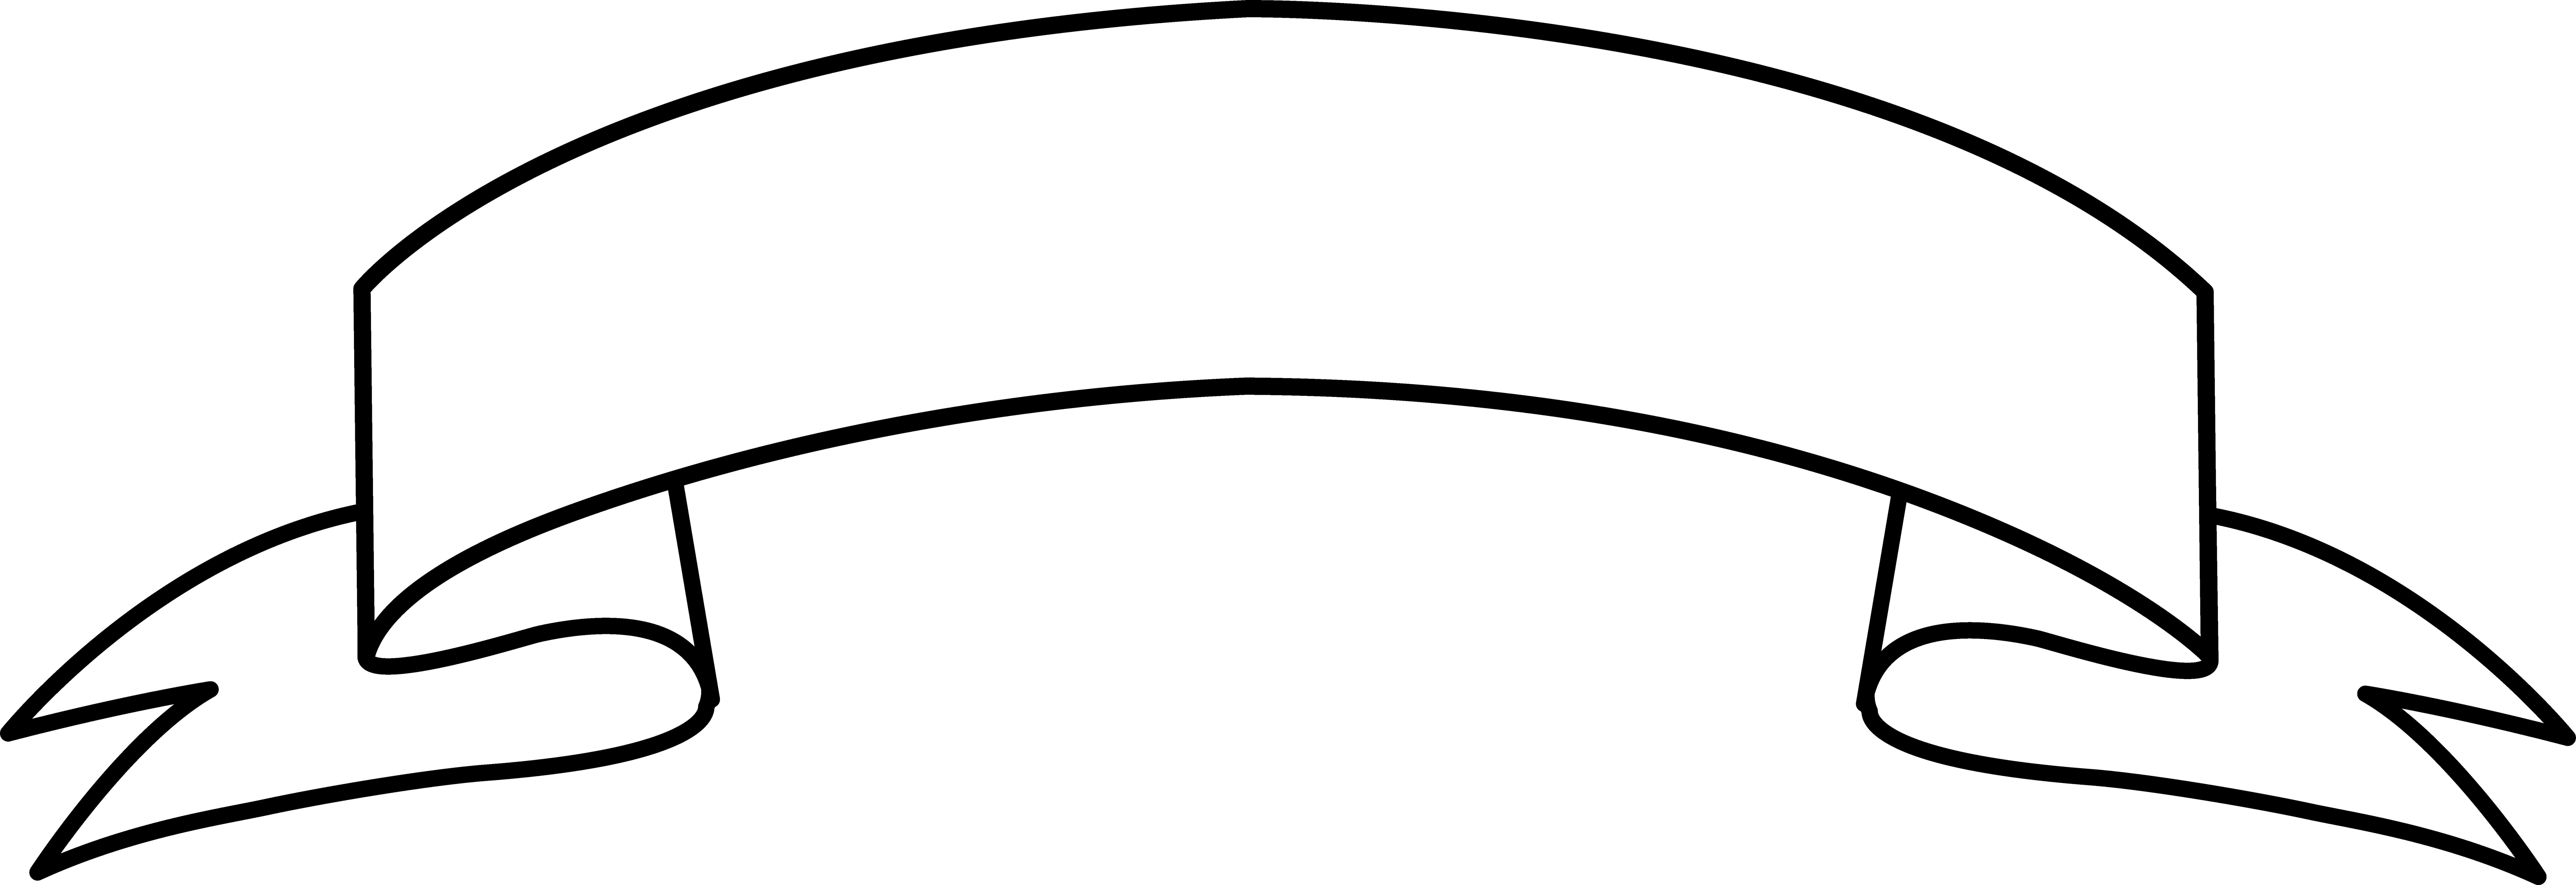 11790x4049 Design Clipart Banner